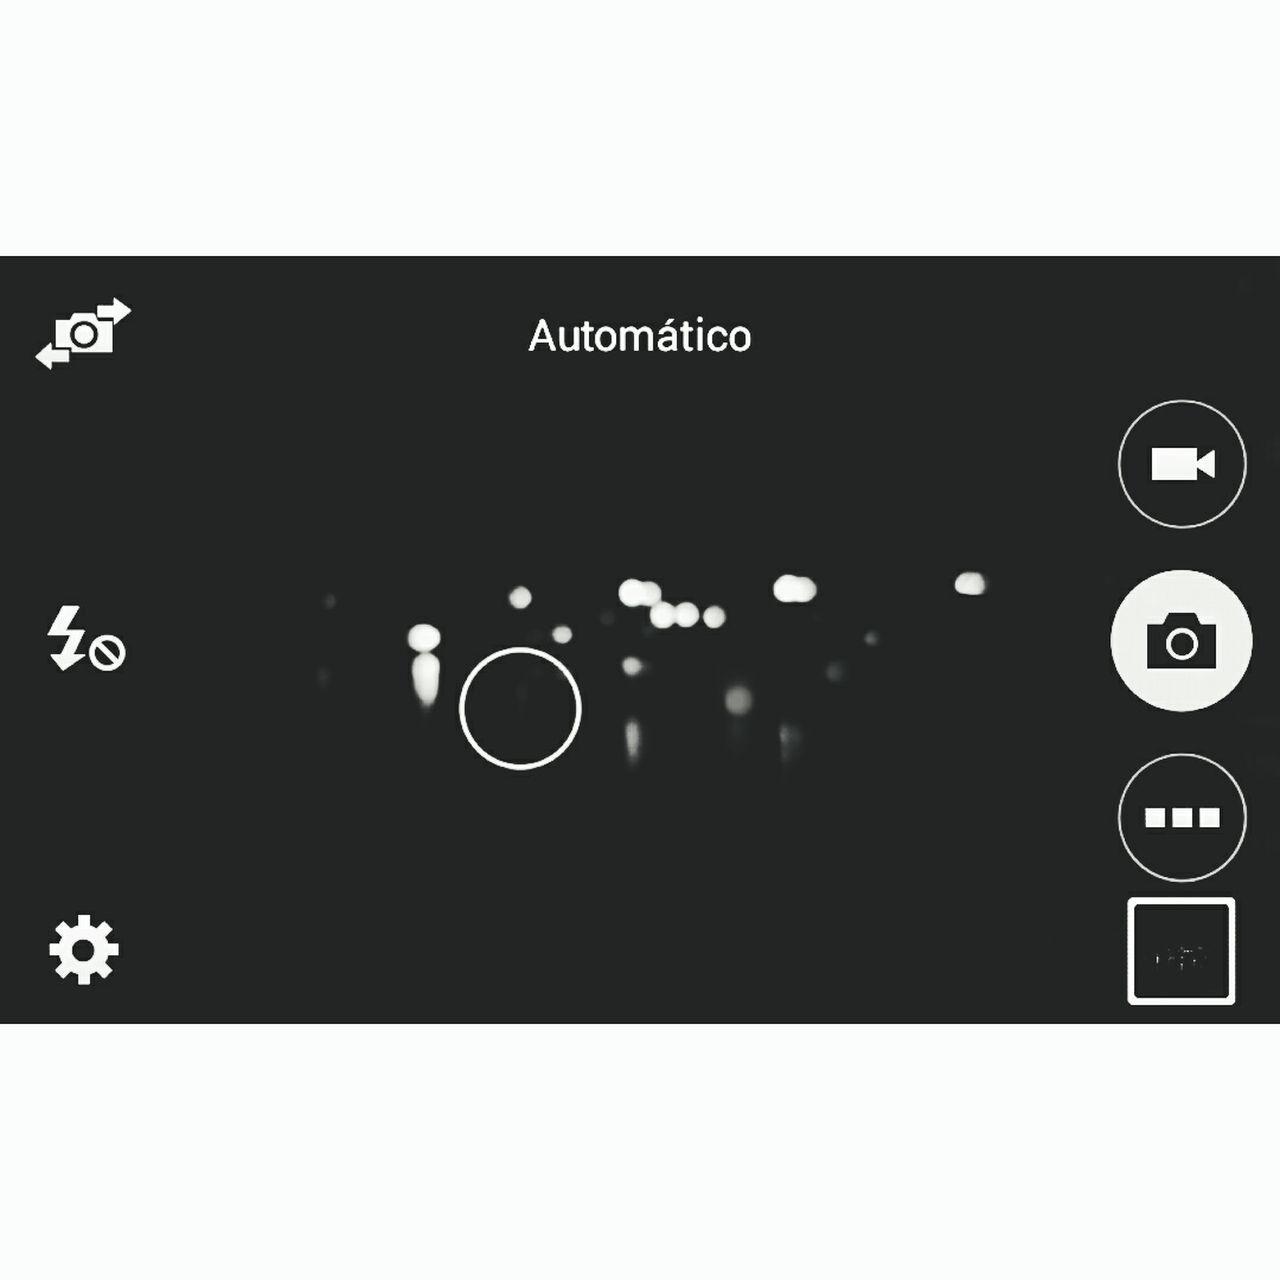 computer icon, design element, symbol, technology, internet, no people, control panel